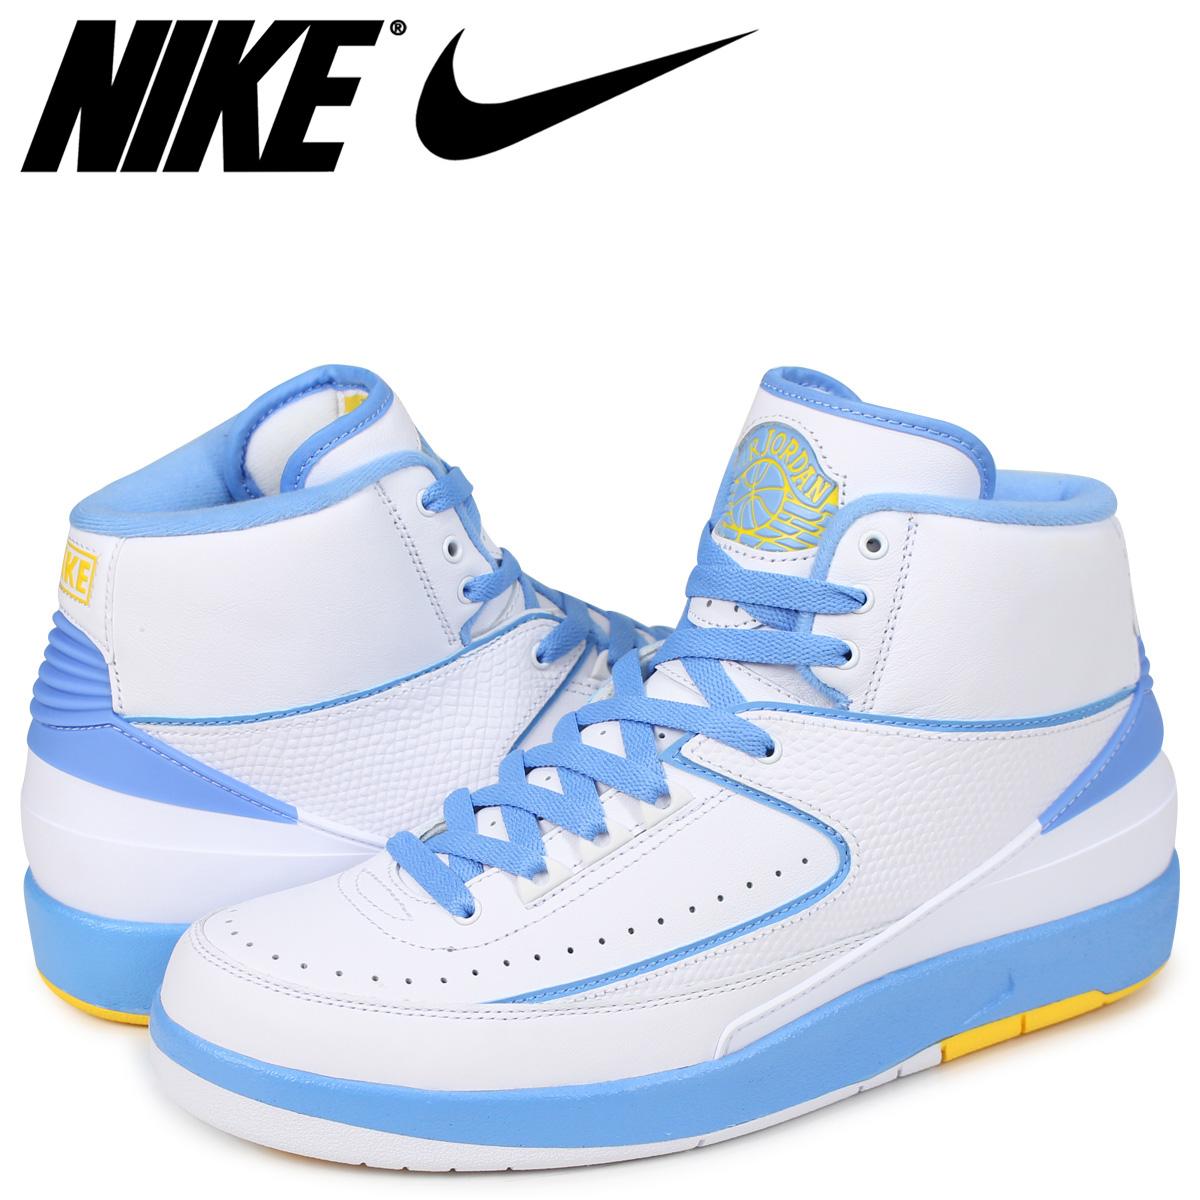 SneaK Online Shop |  Global Market: Nike NIKE Air men Jordan 2 nostalgic sneakers men Air AIR JORDAN 2 RETRO MELO 385,475-122 white [load planned Shinnyu load in reservation product 6/20 containing] 528369